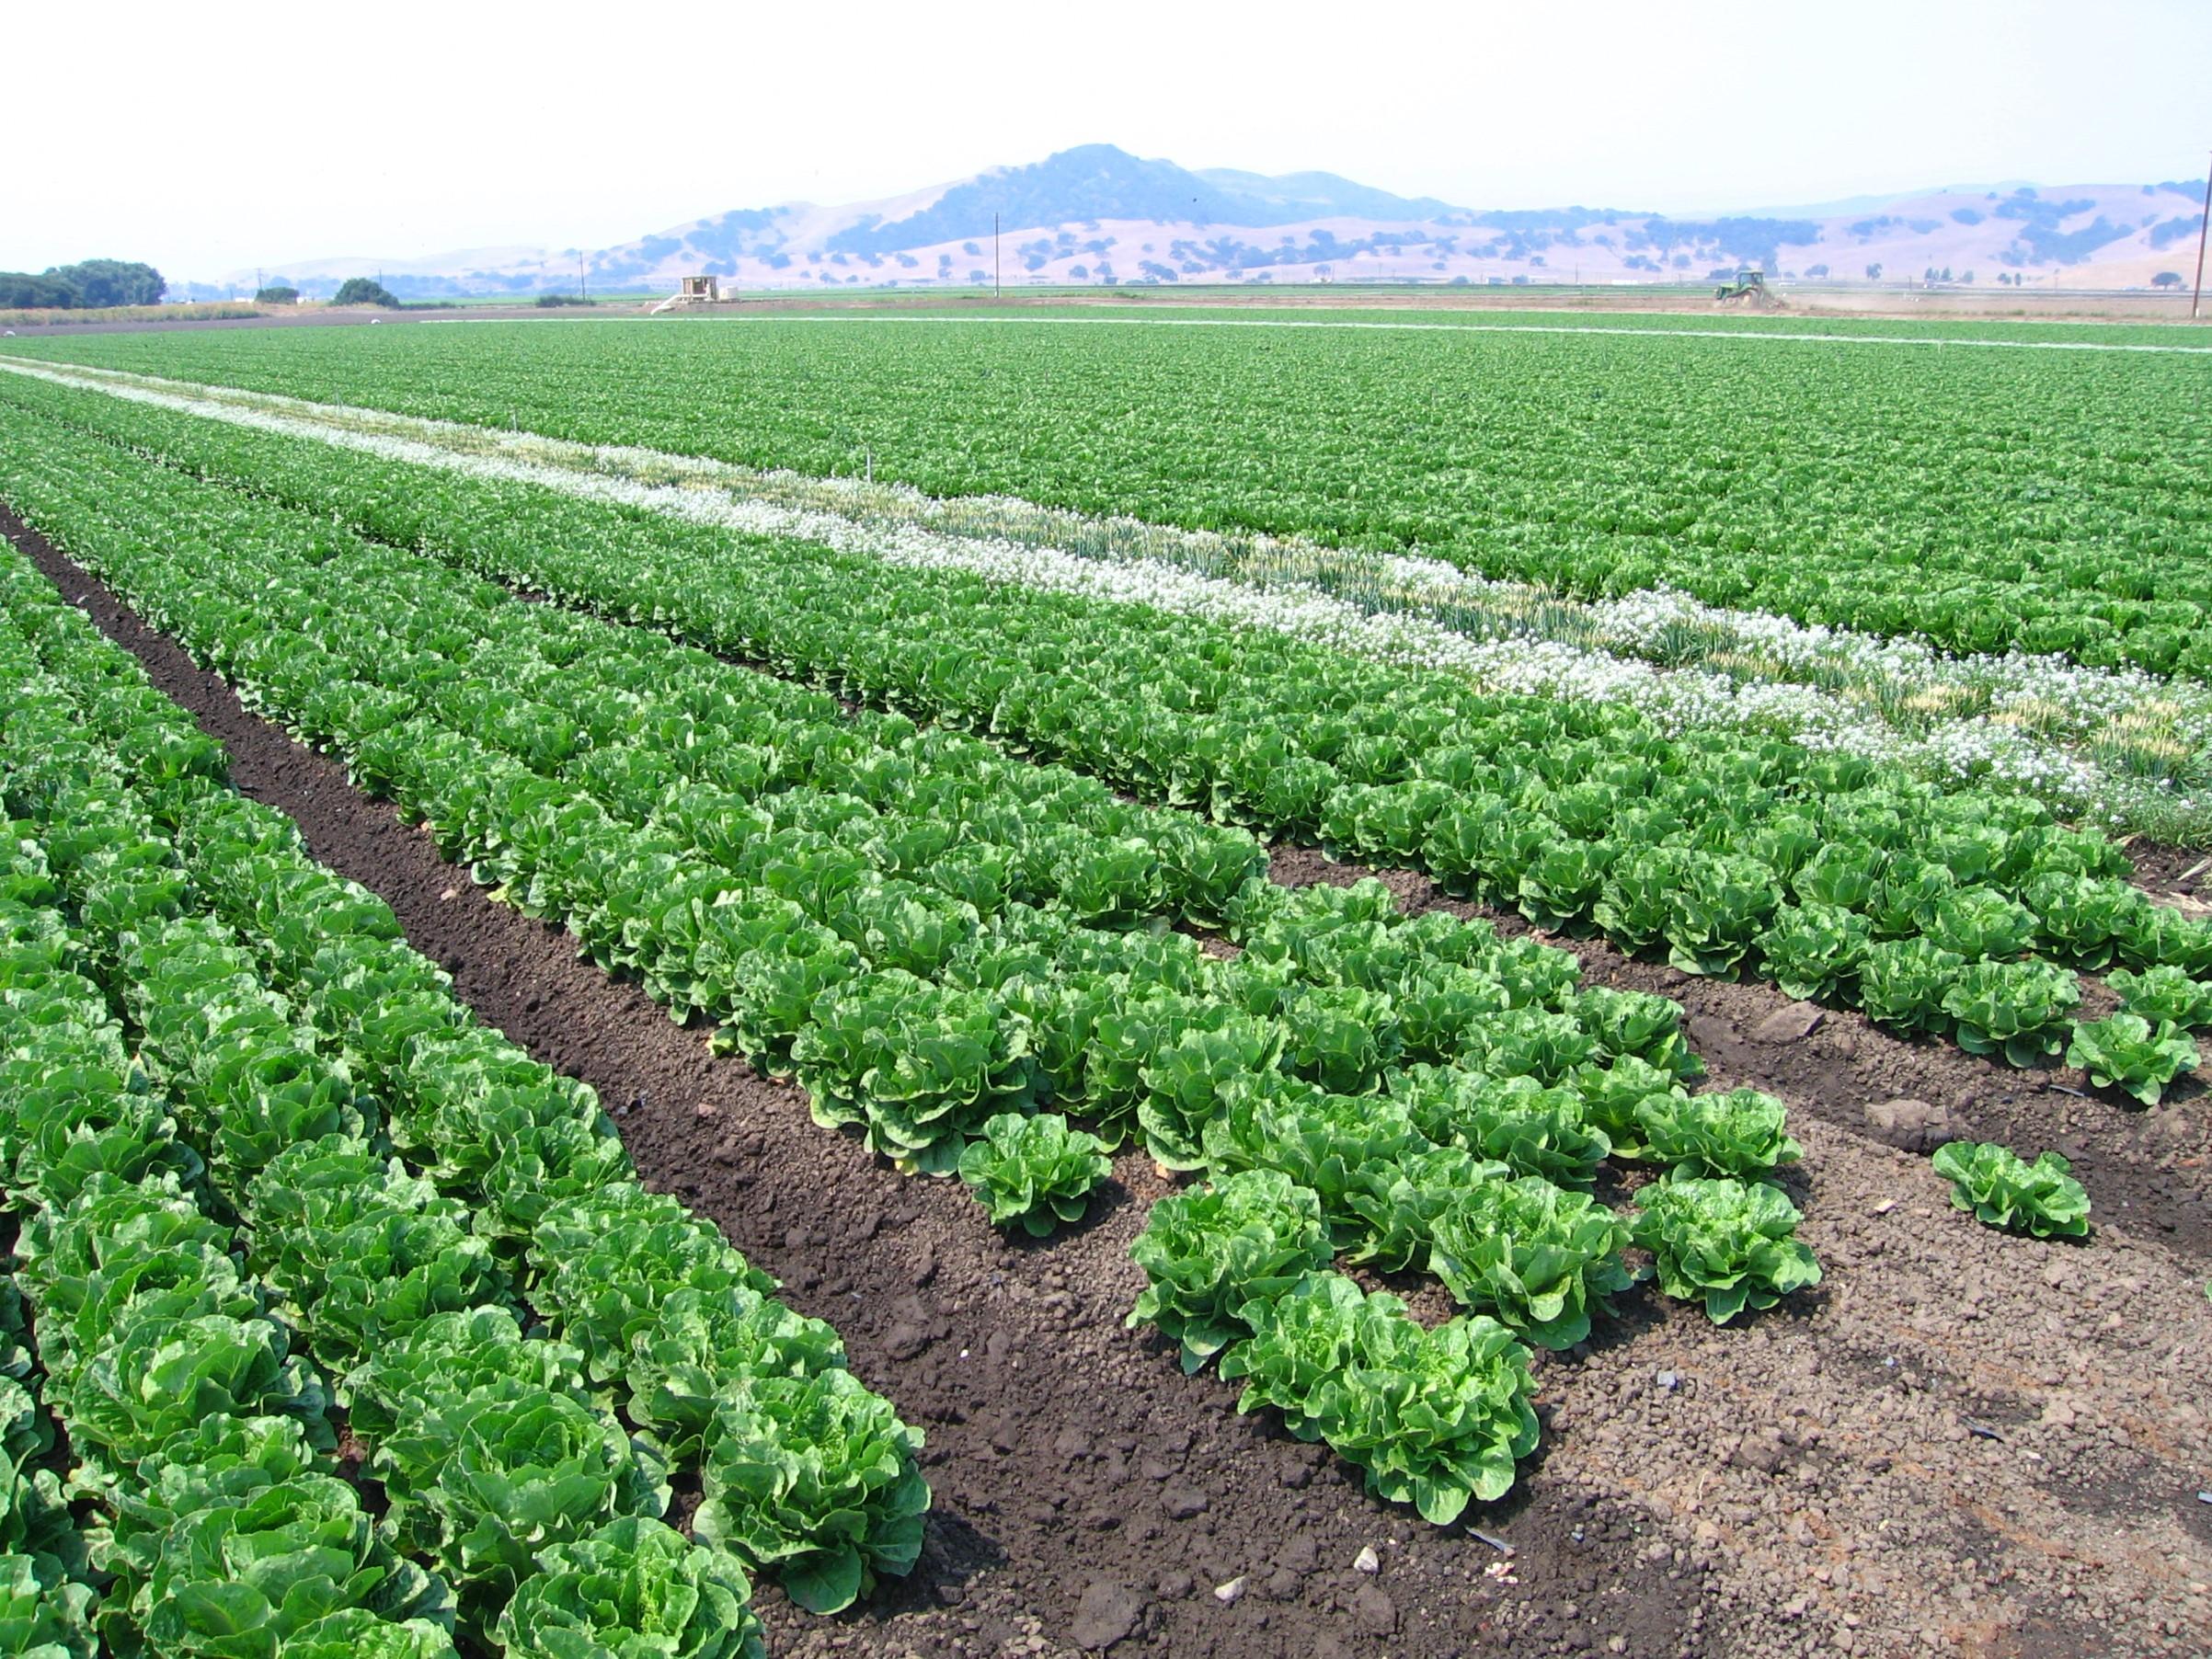 Row Crops - C.Hutnik - 06-2008 - 9